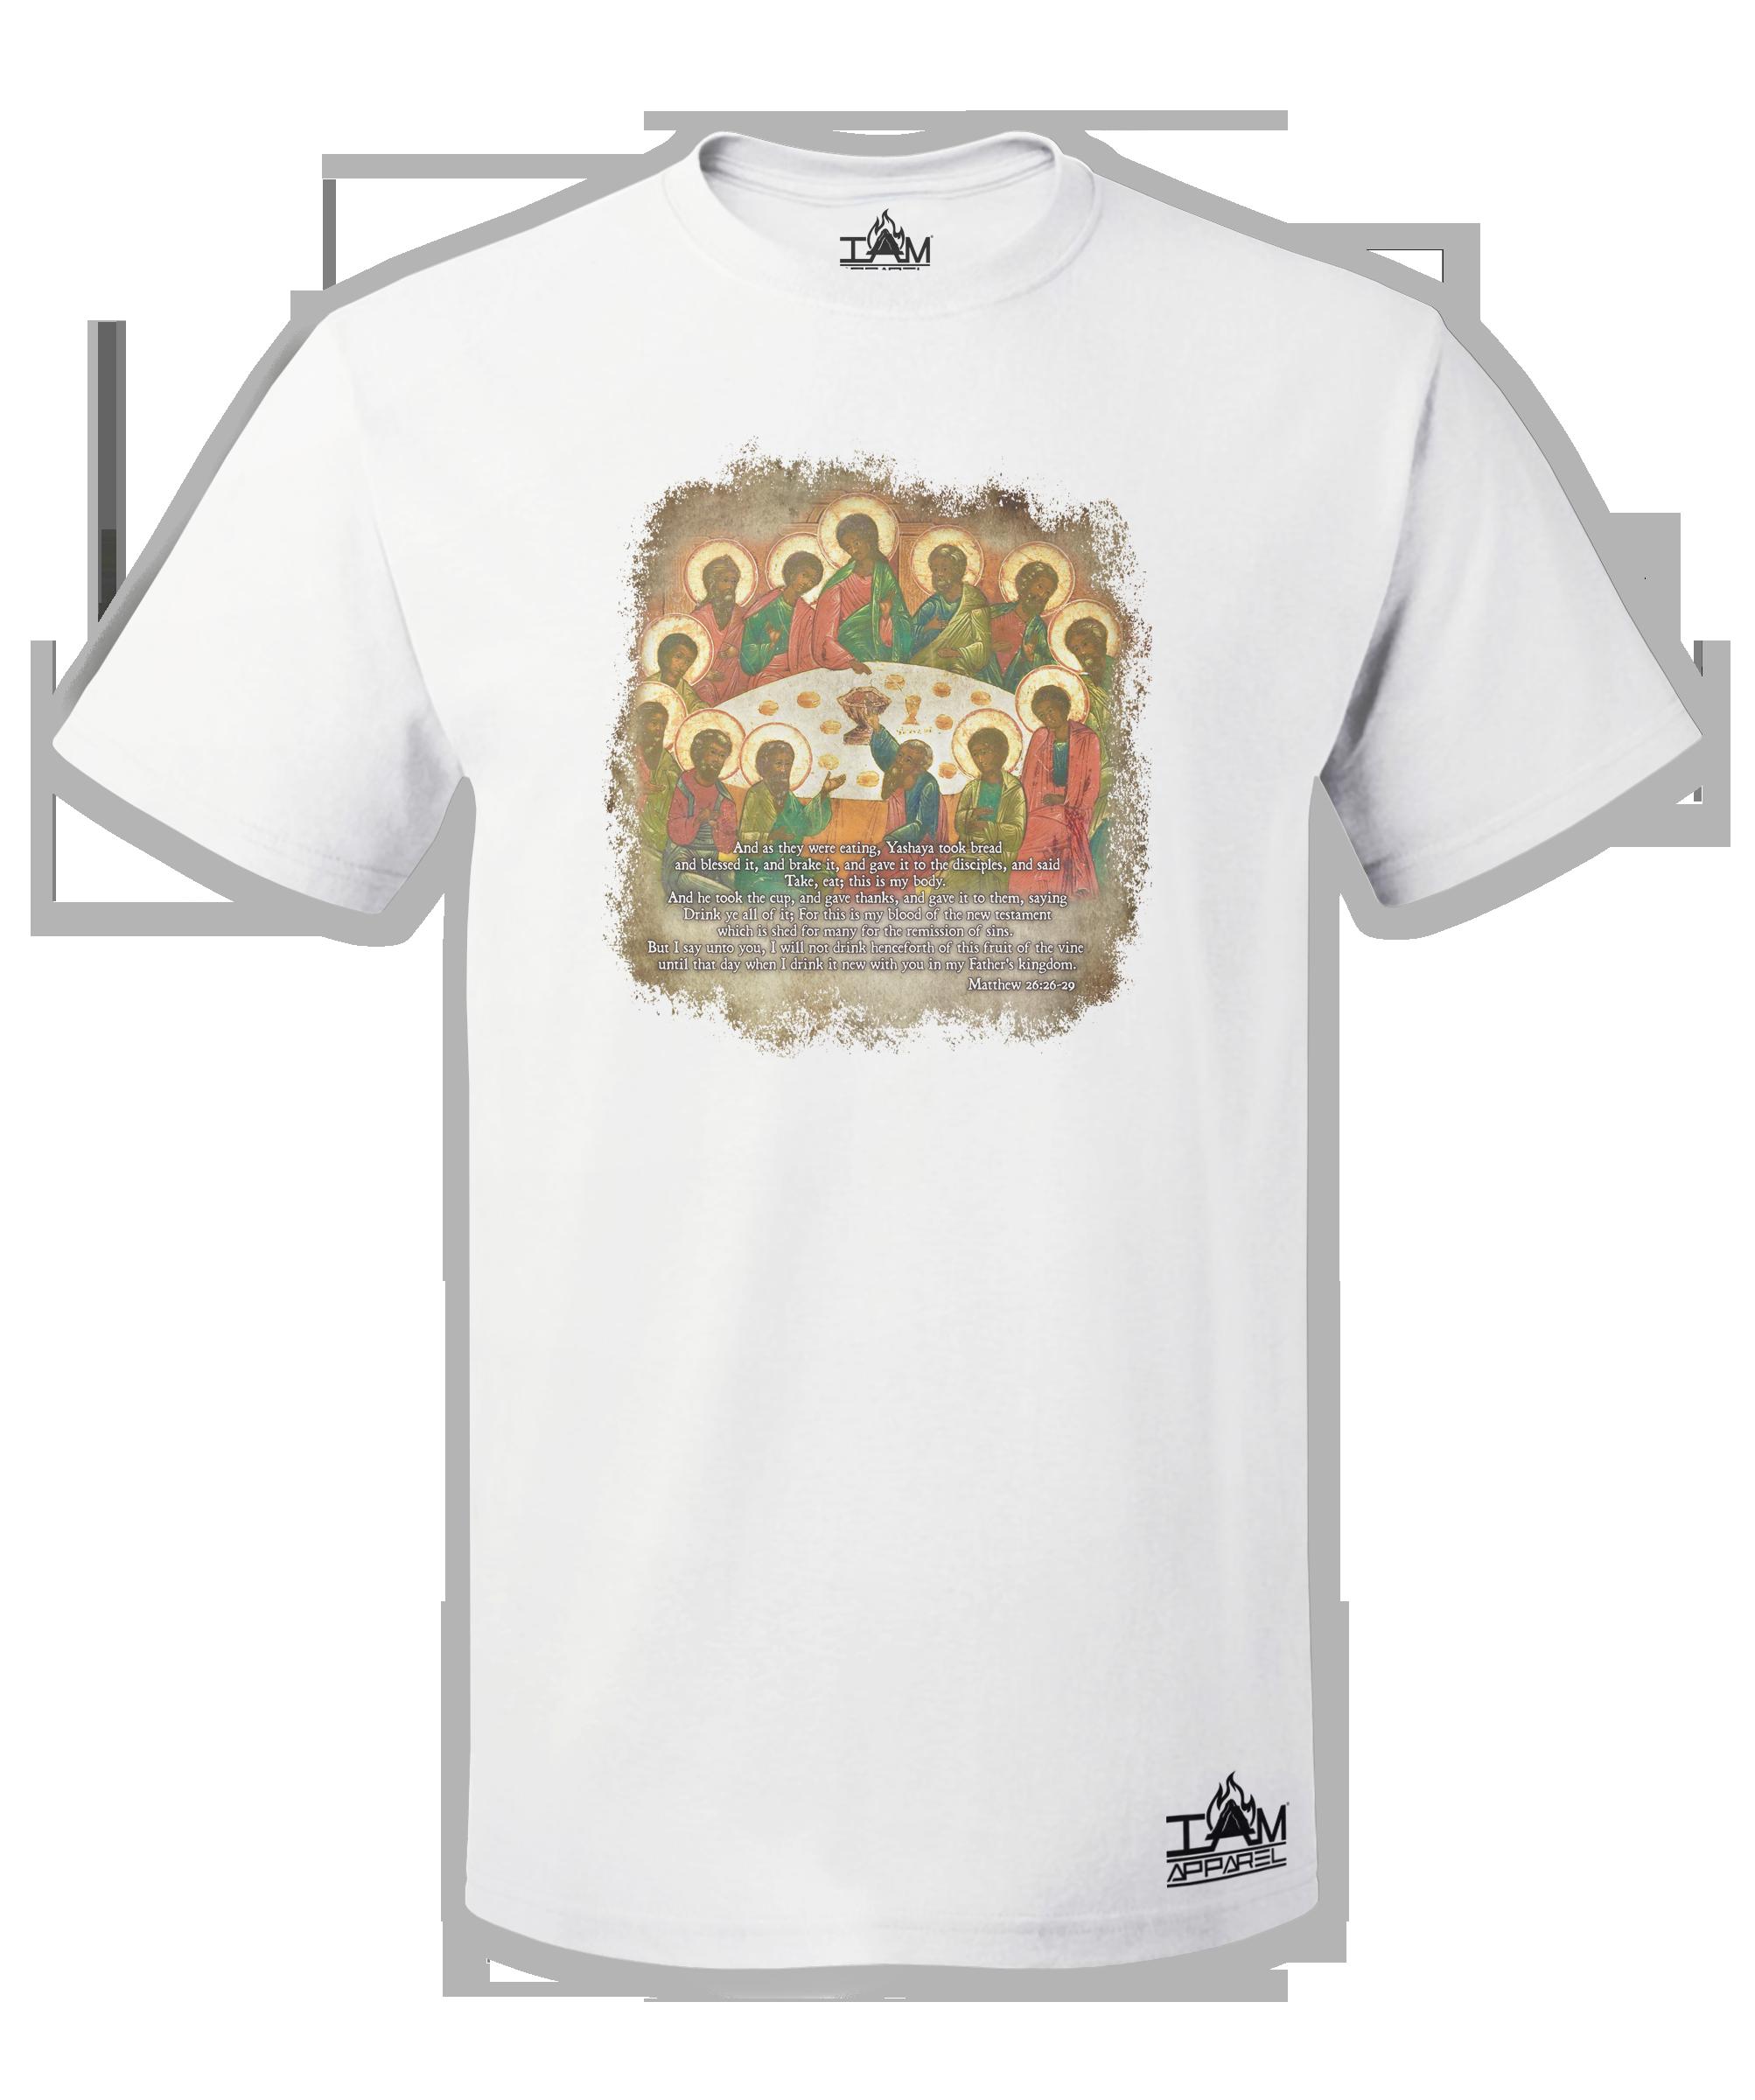 The Last Supper Men's  Short Sleeved T-shirt 00149